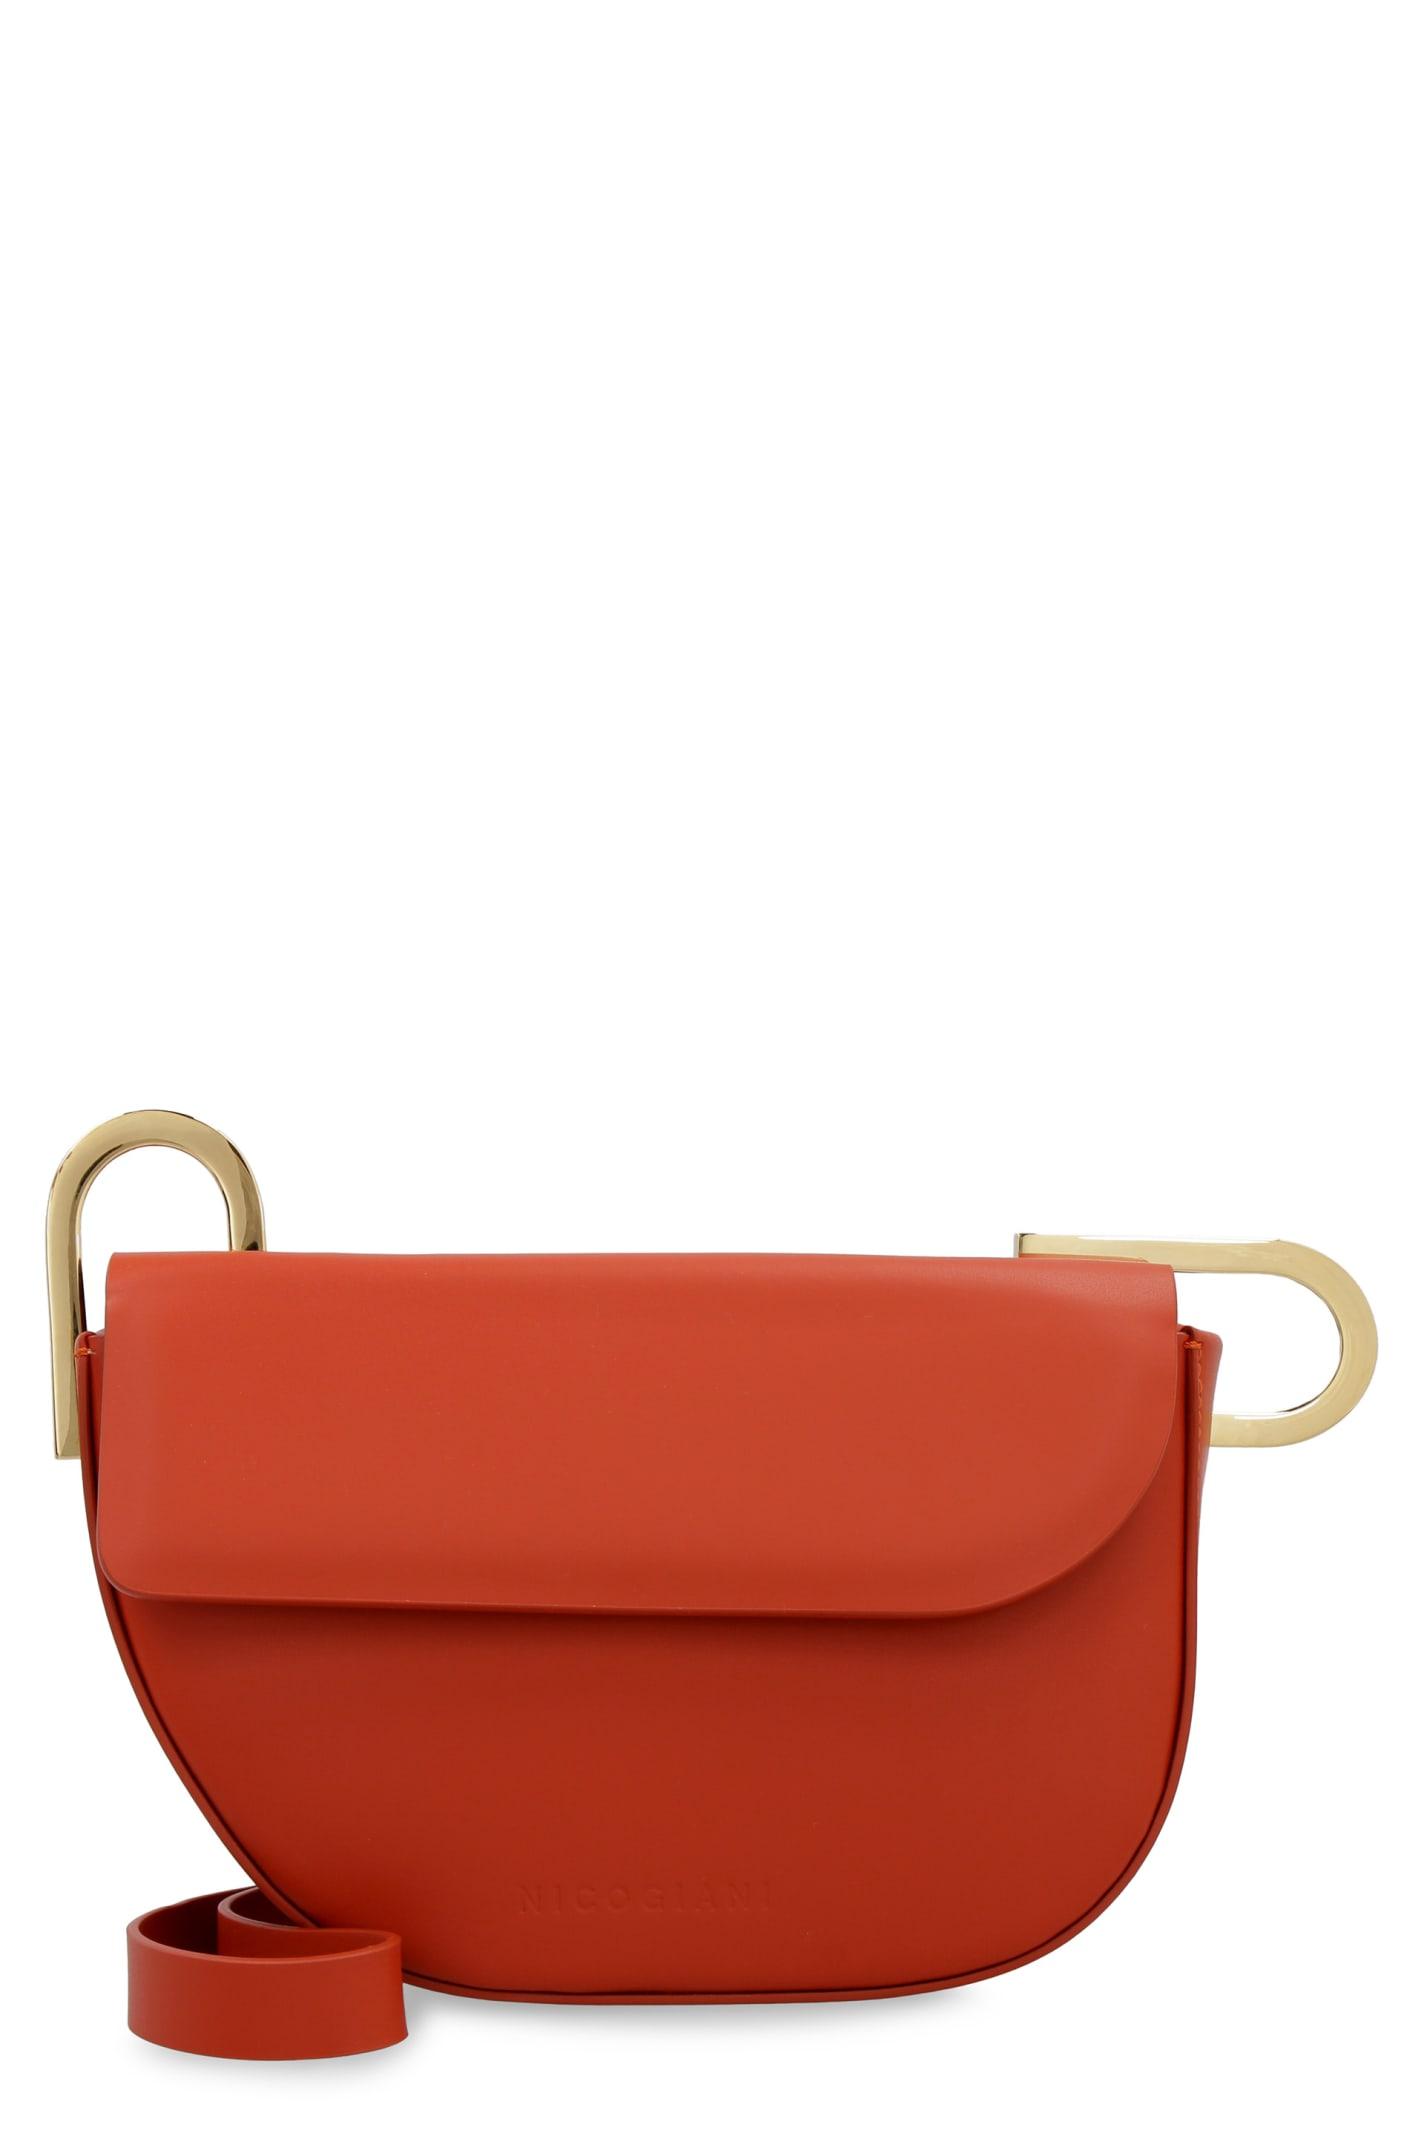 Nico Giani Tilly Leather Crossbody Bag